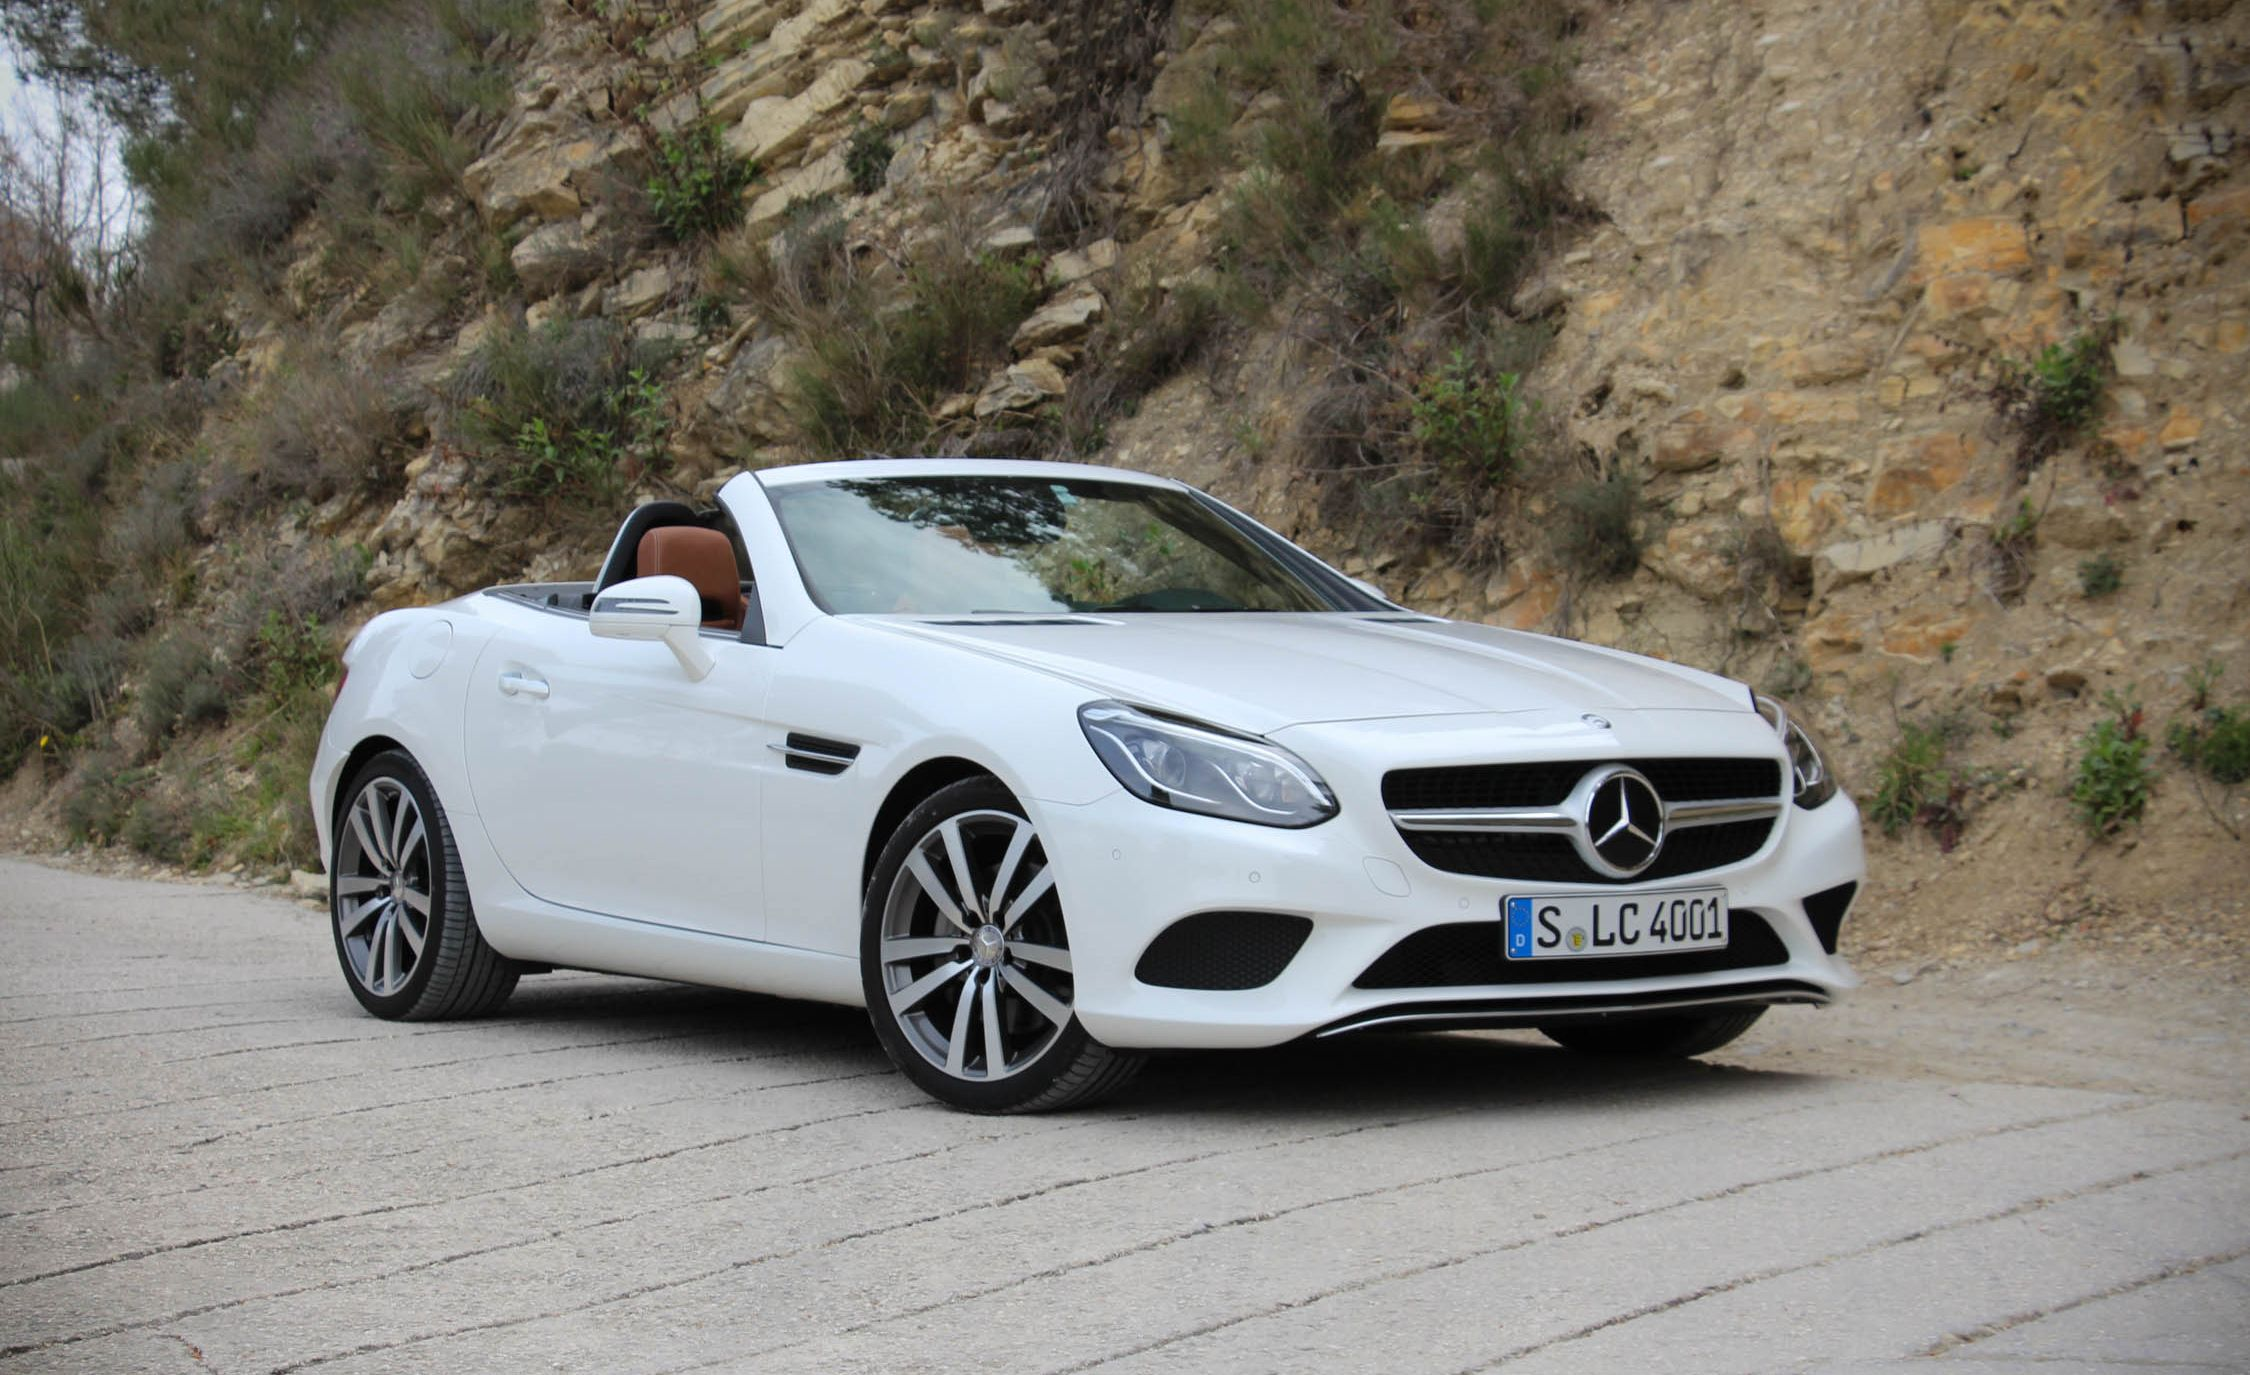 2020 Mercedes Benz Slc Cl Reviews Price Photos And Specs Car Driver